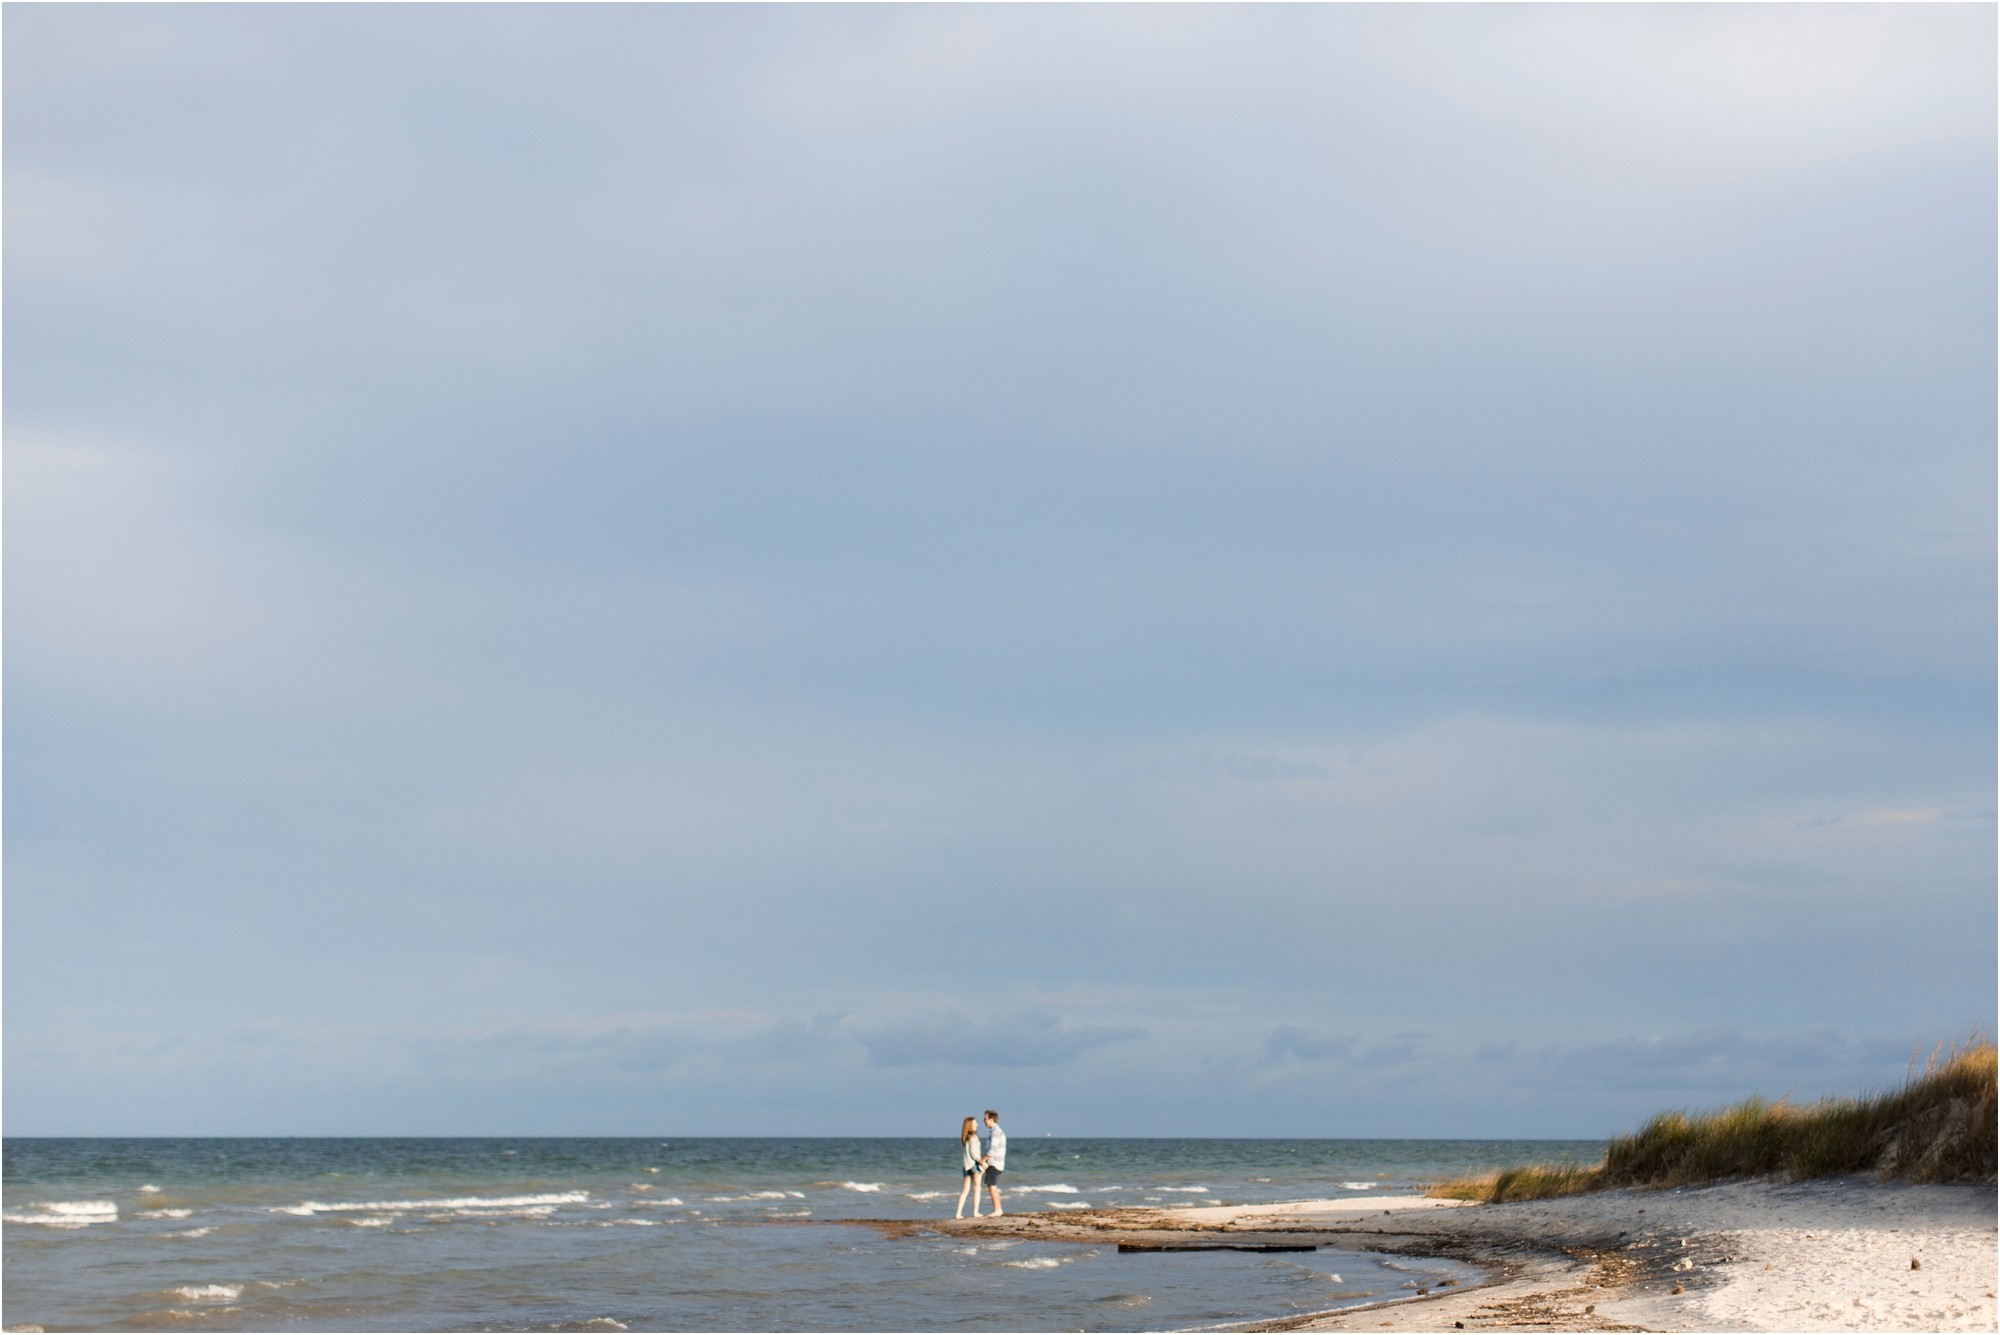 emily-drew-chesapeake-bay-beach-virginia-engagement-photos_0009.jpg